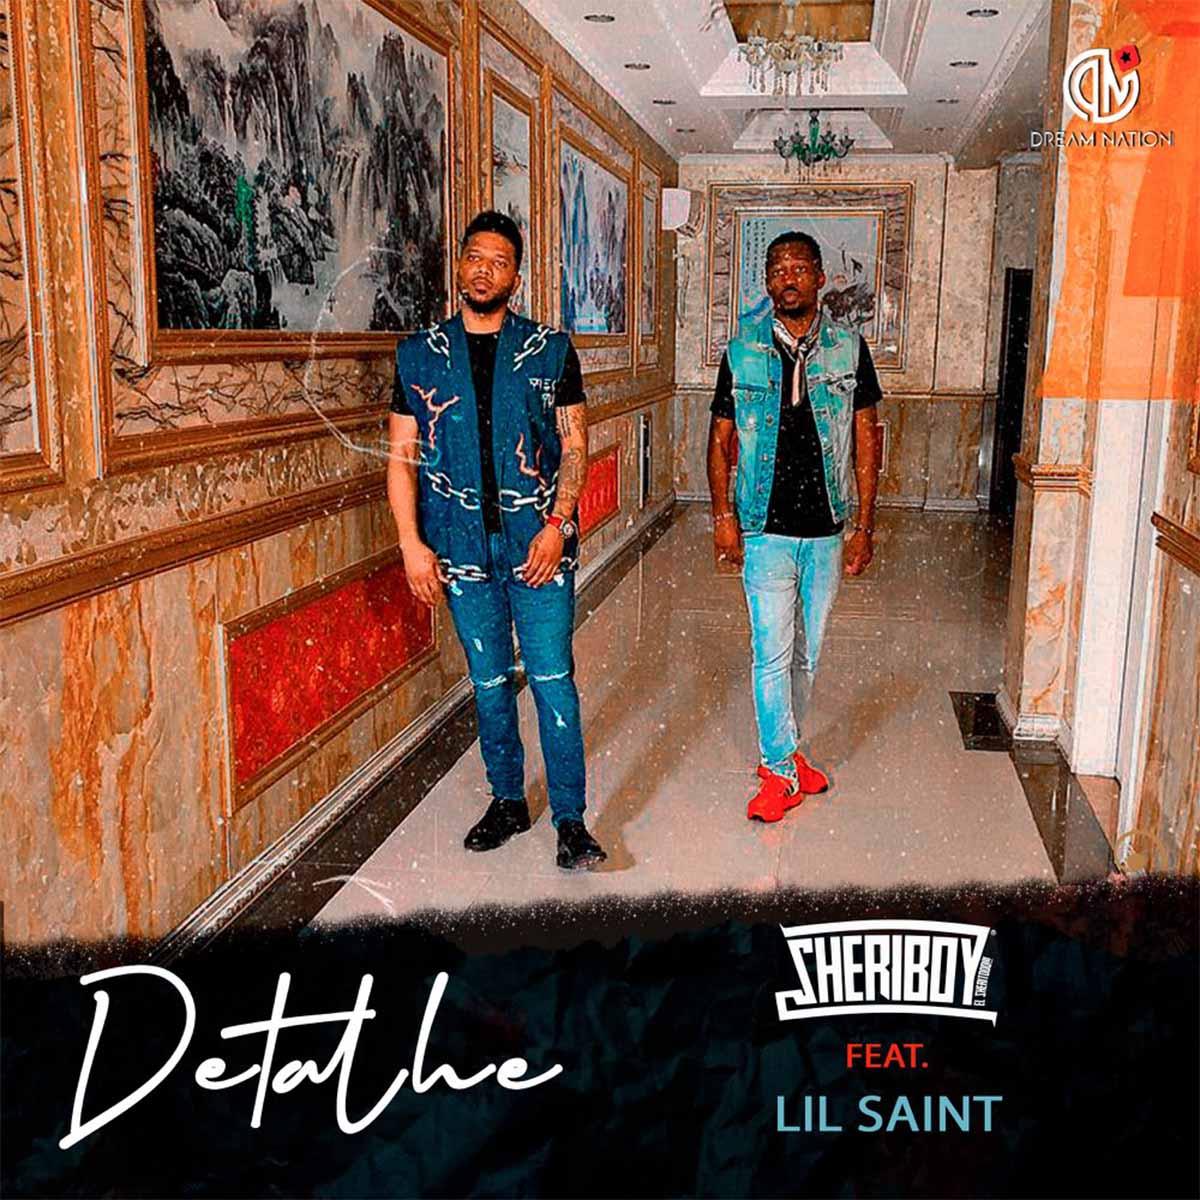 Sheriboy - Detalhe (feat. Lil Saint)